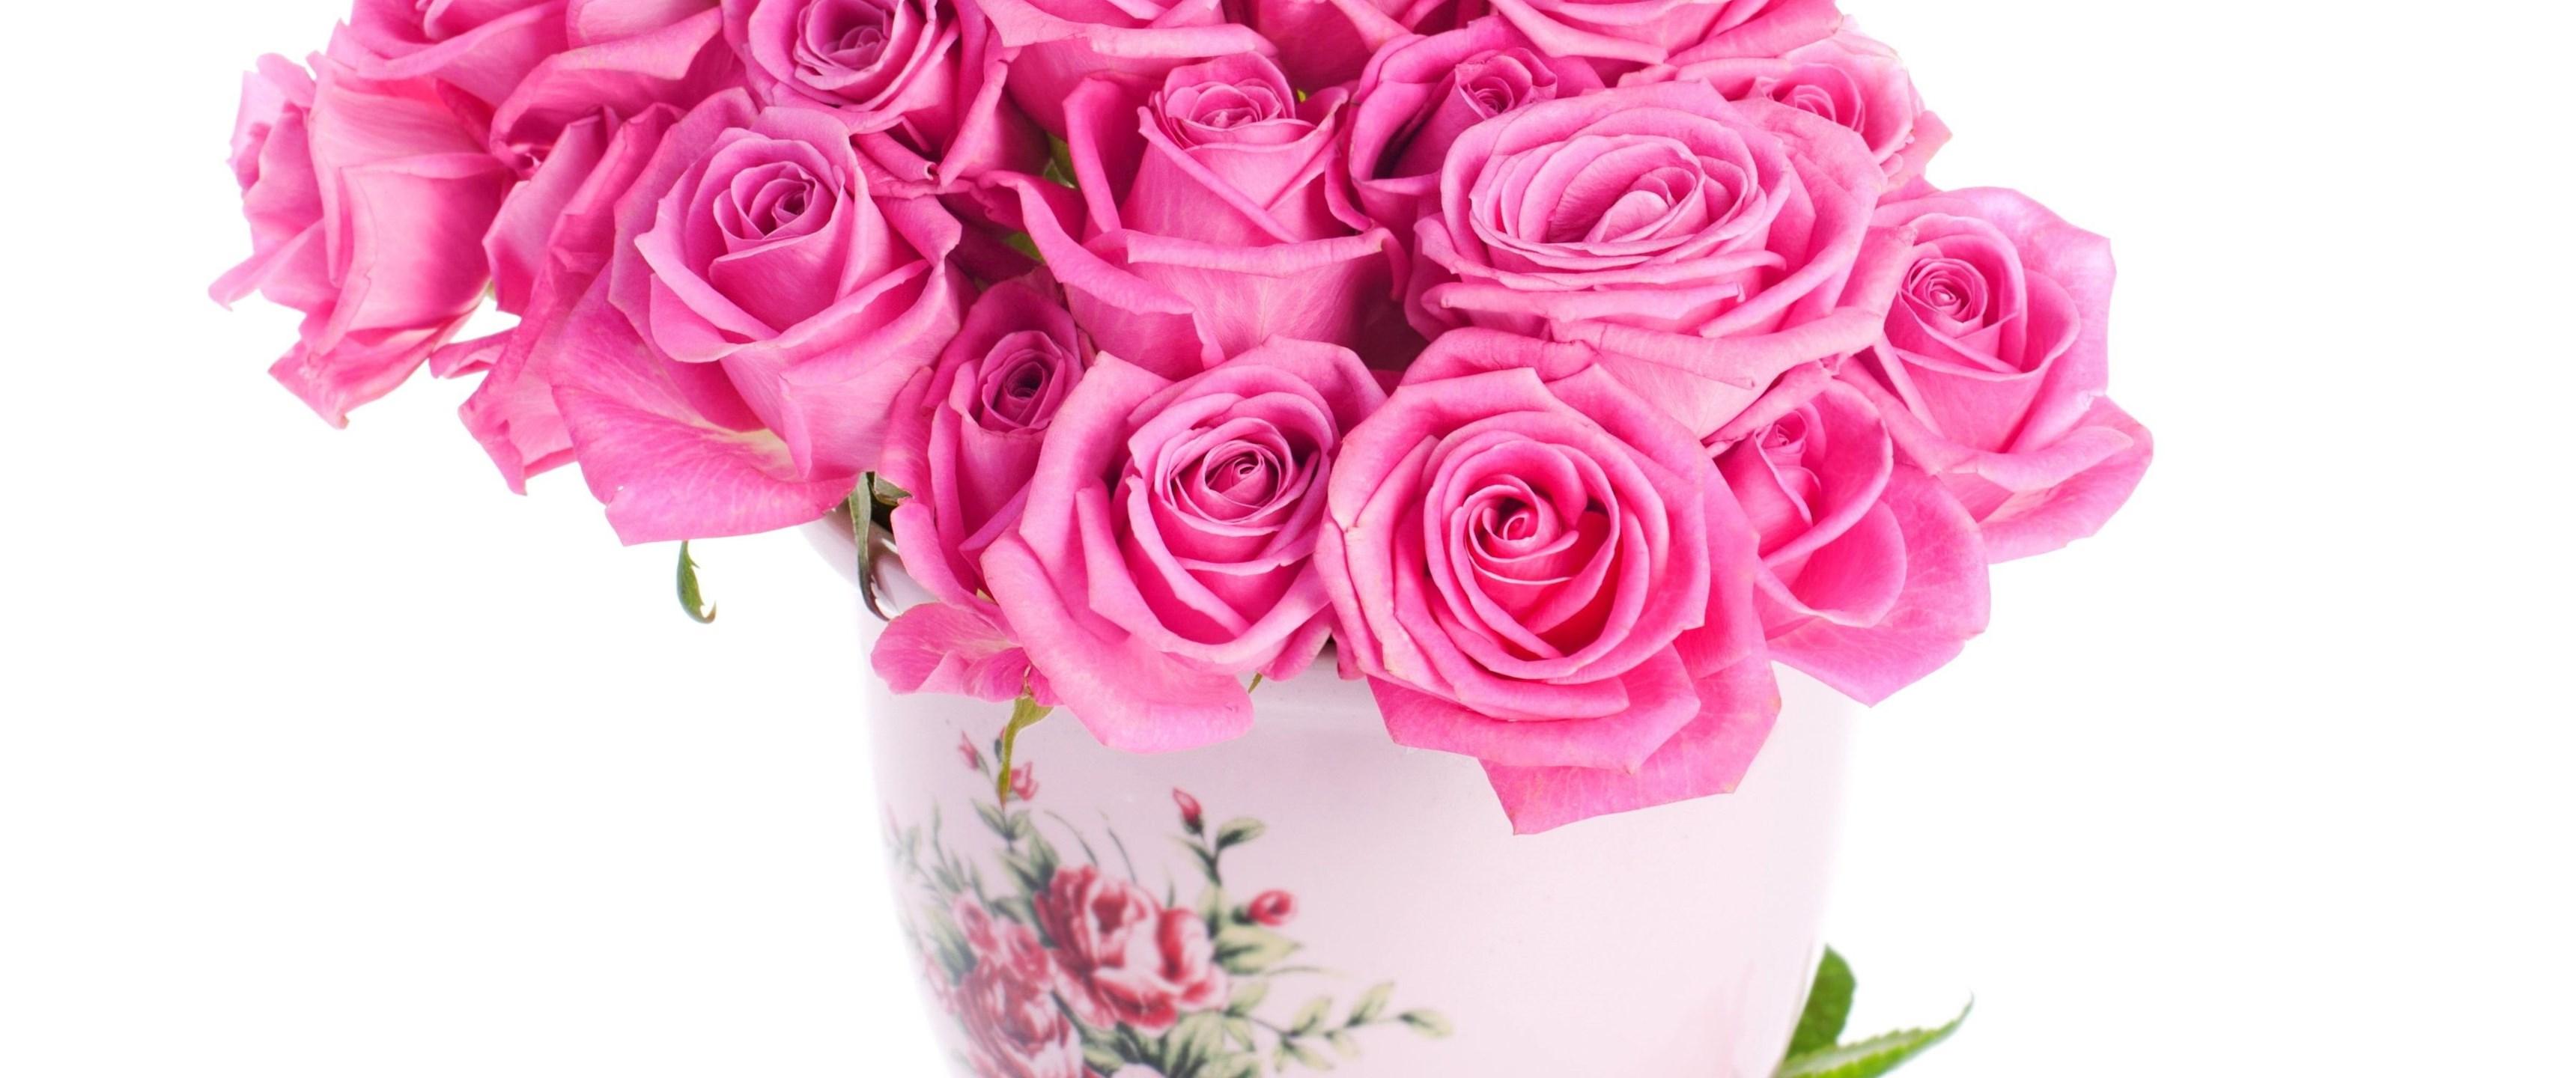 Worlds top 100 beautiful flowers images wallpapers photos free widescreen izmirmasajfo